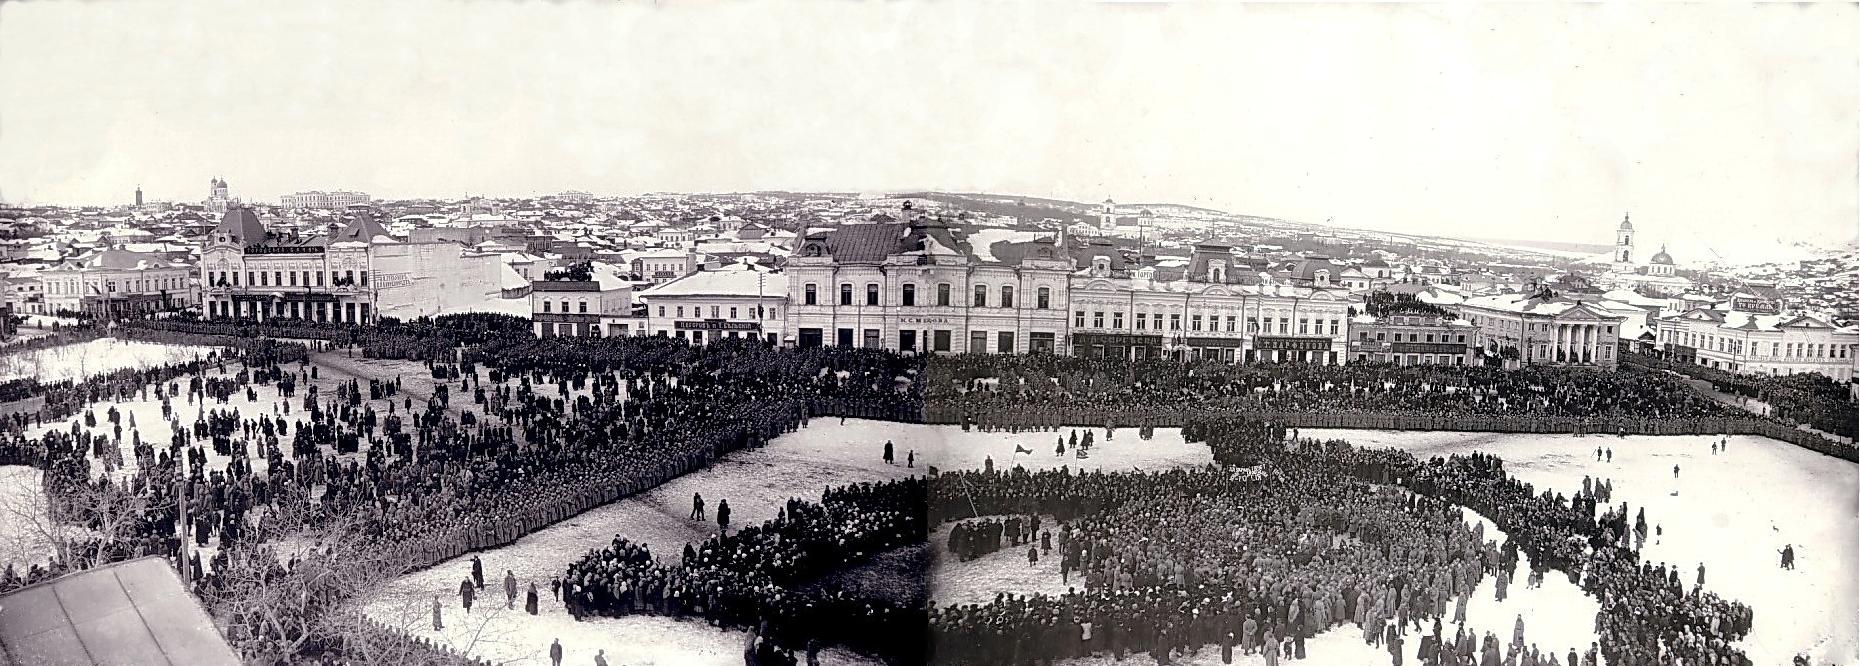 Митинг на Соборной площади 16 марта 1917